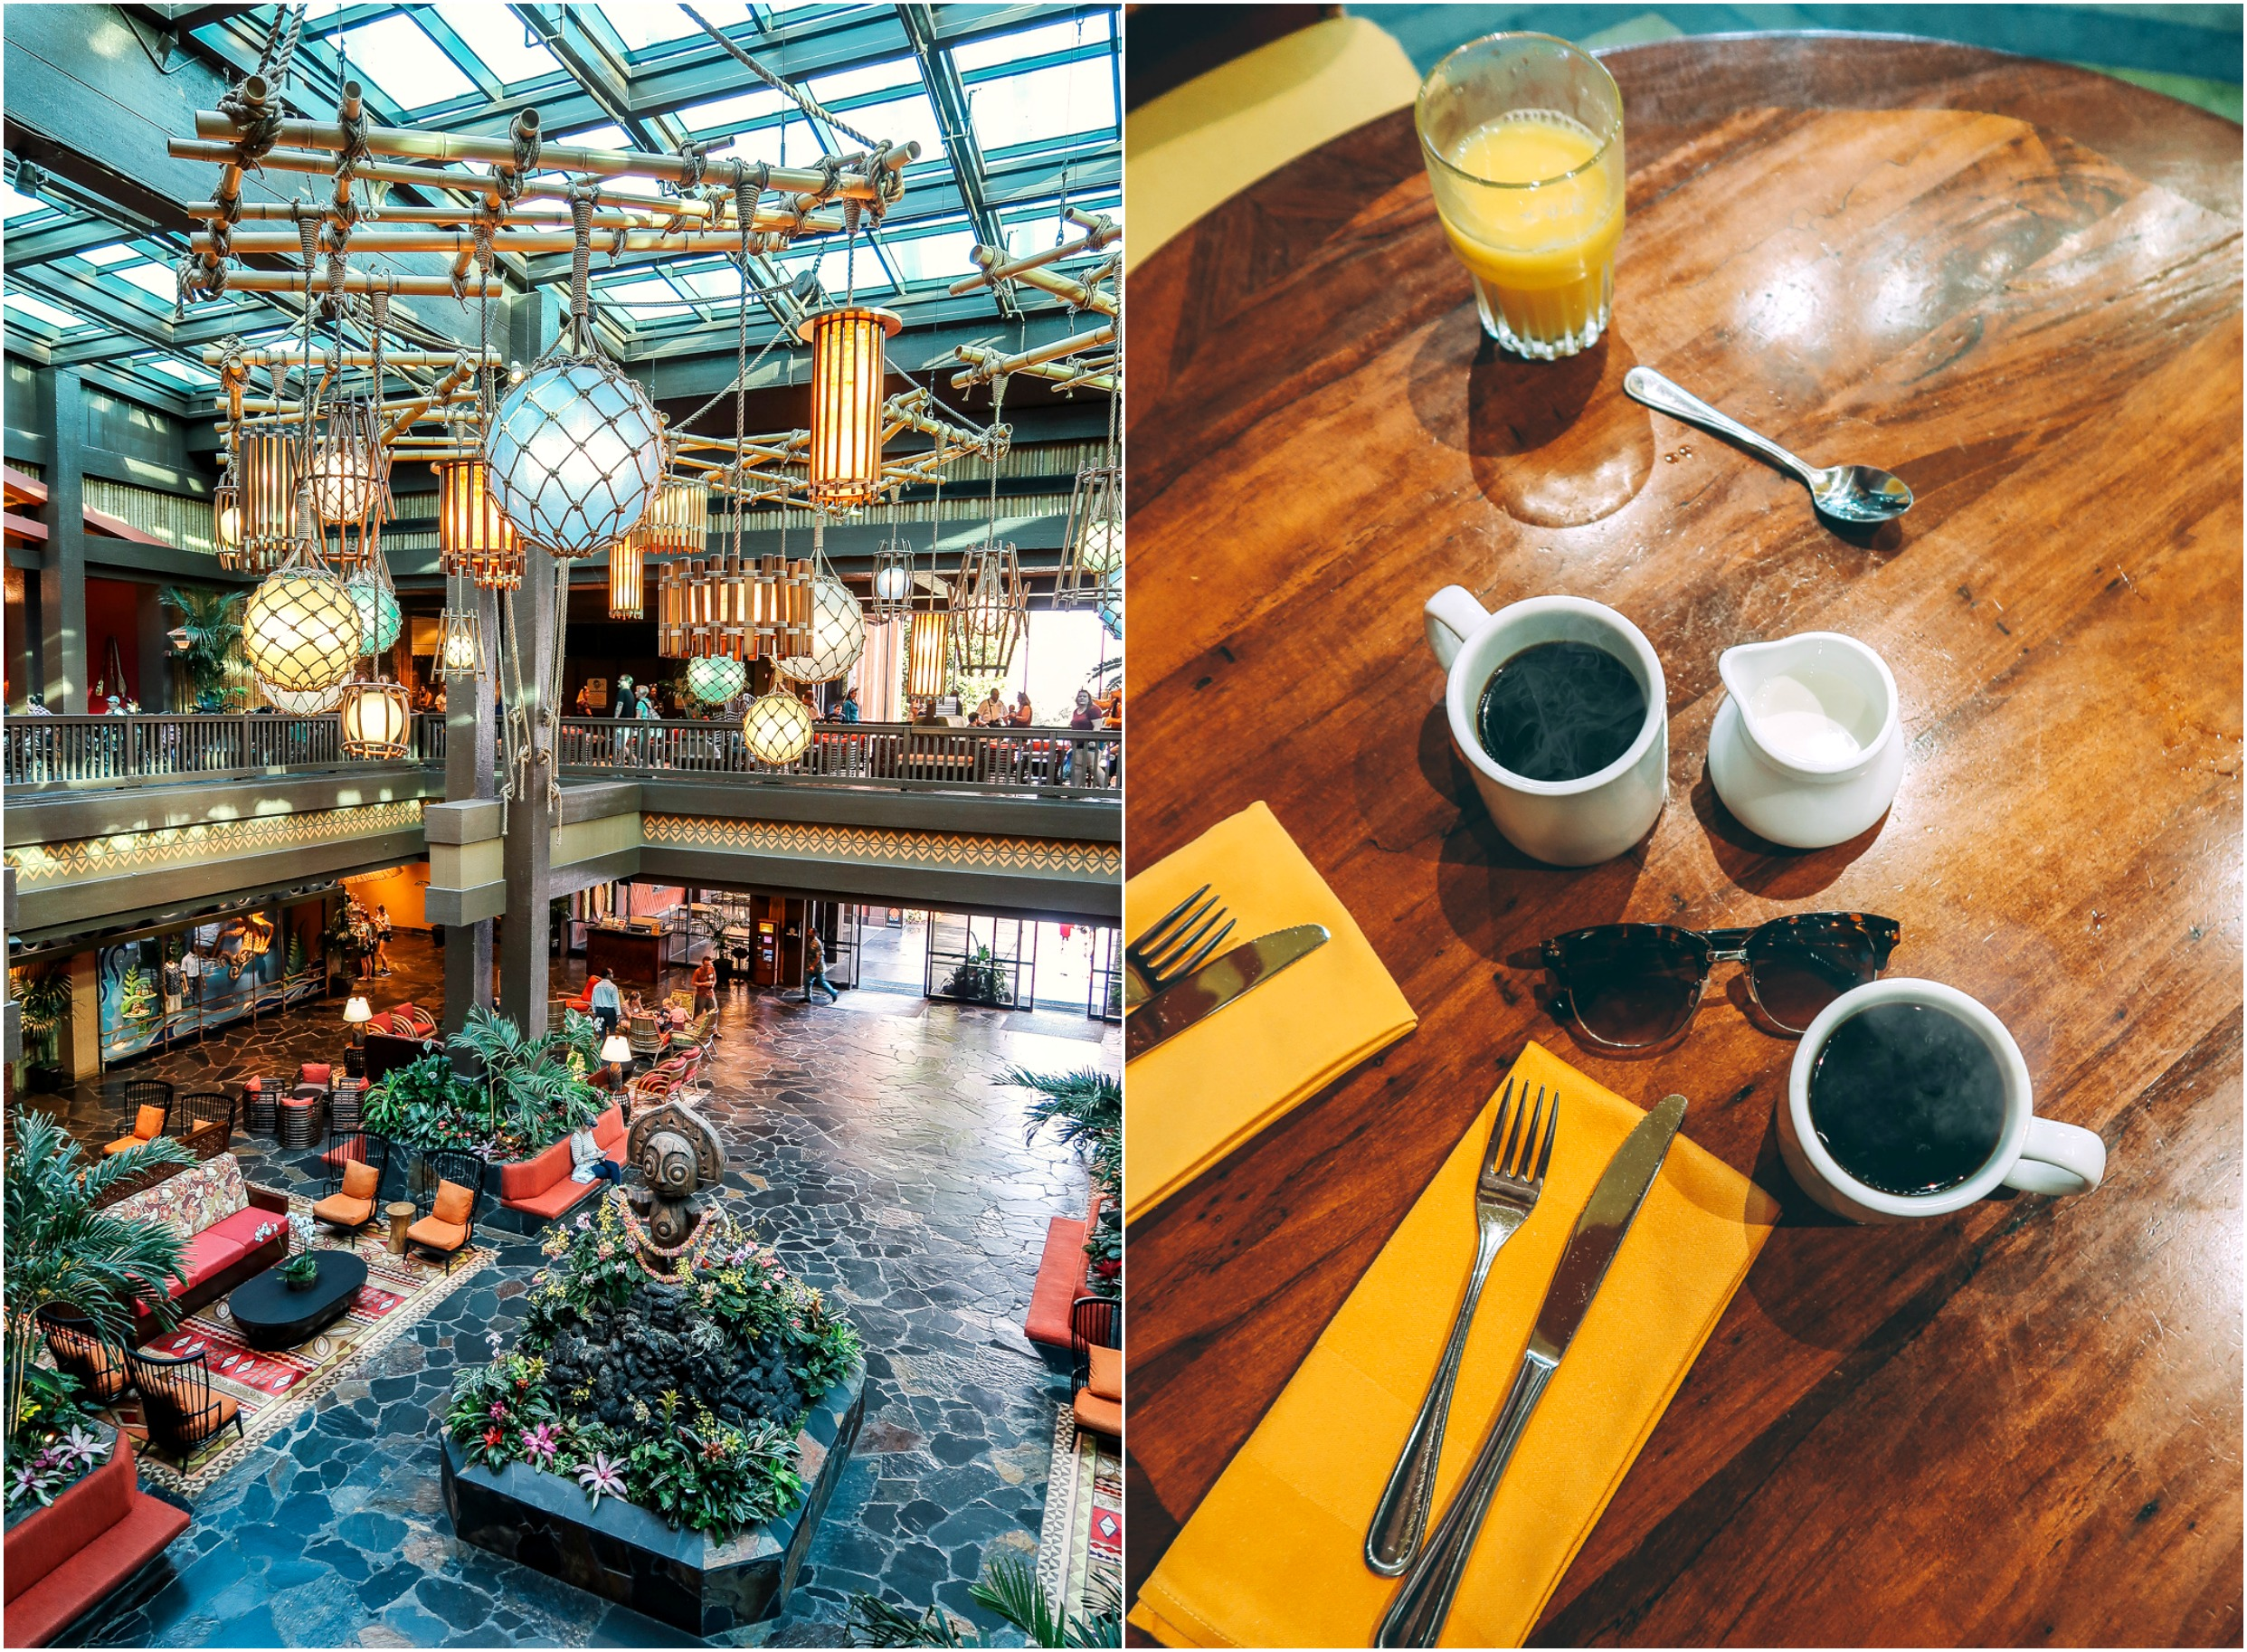 Kona Cafe at the Polynesian Village Resort best coffee at disney world